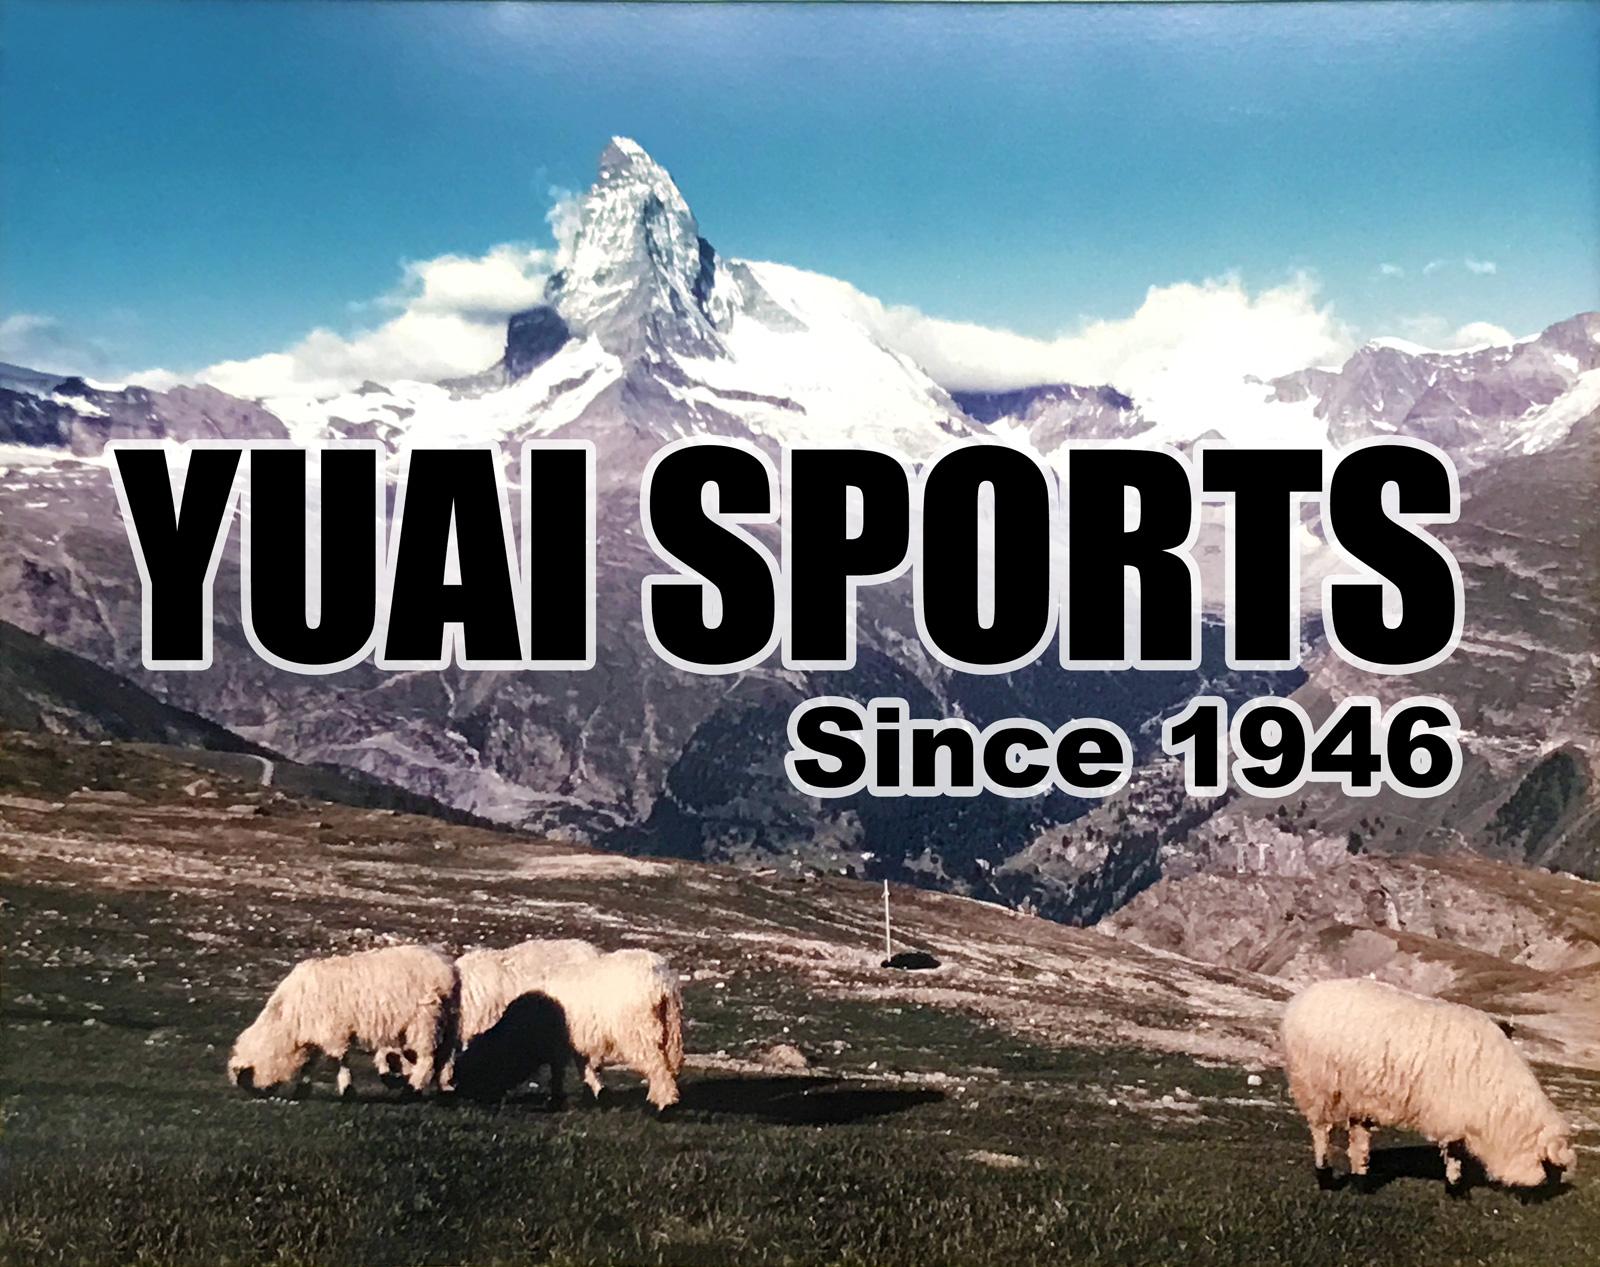 YUAI SPORTS Since 1946